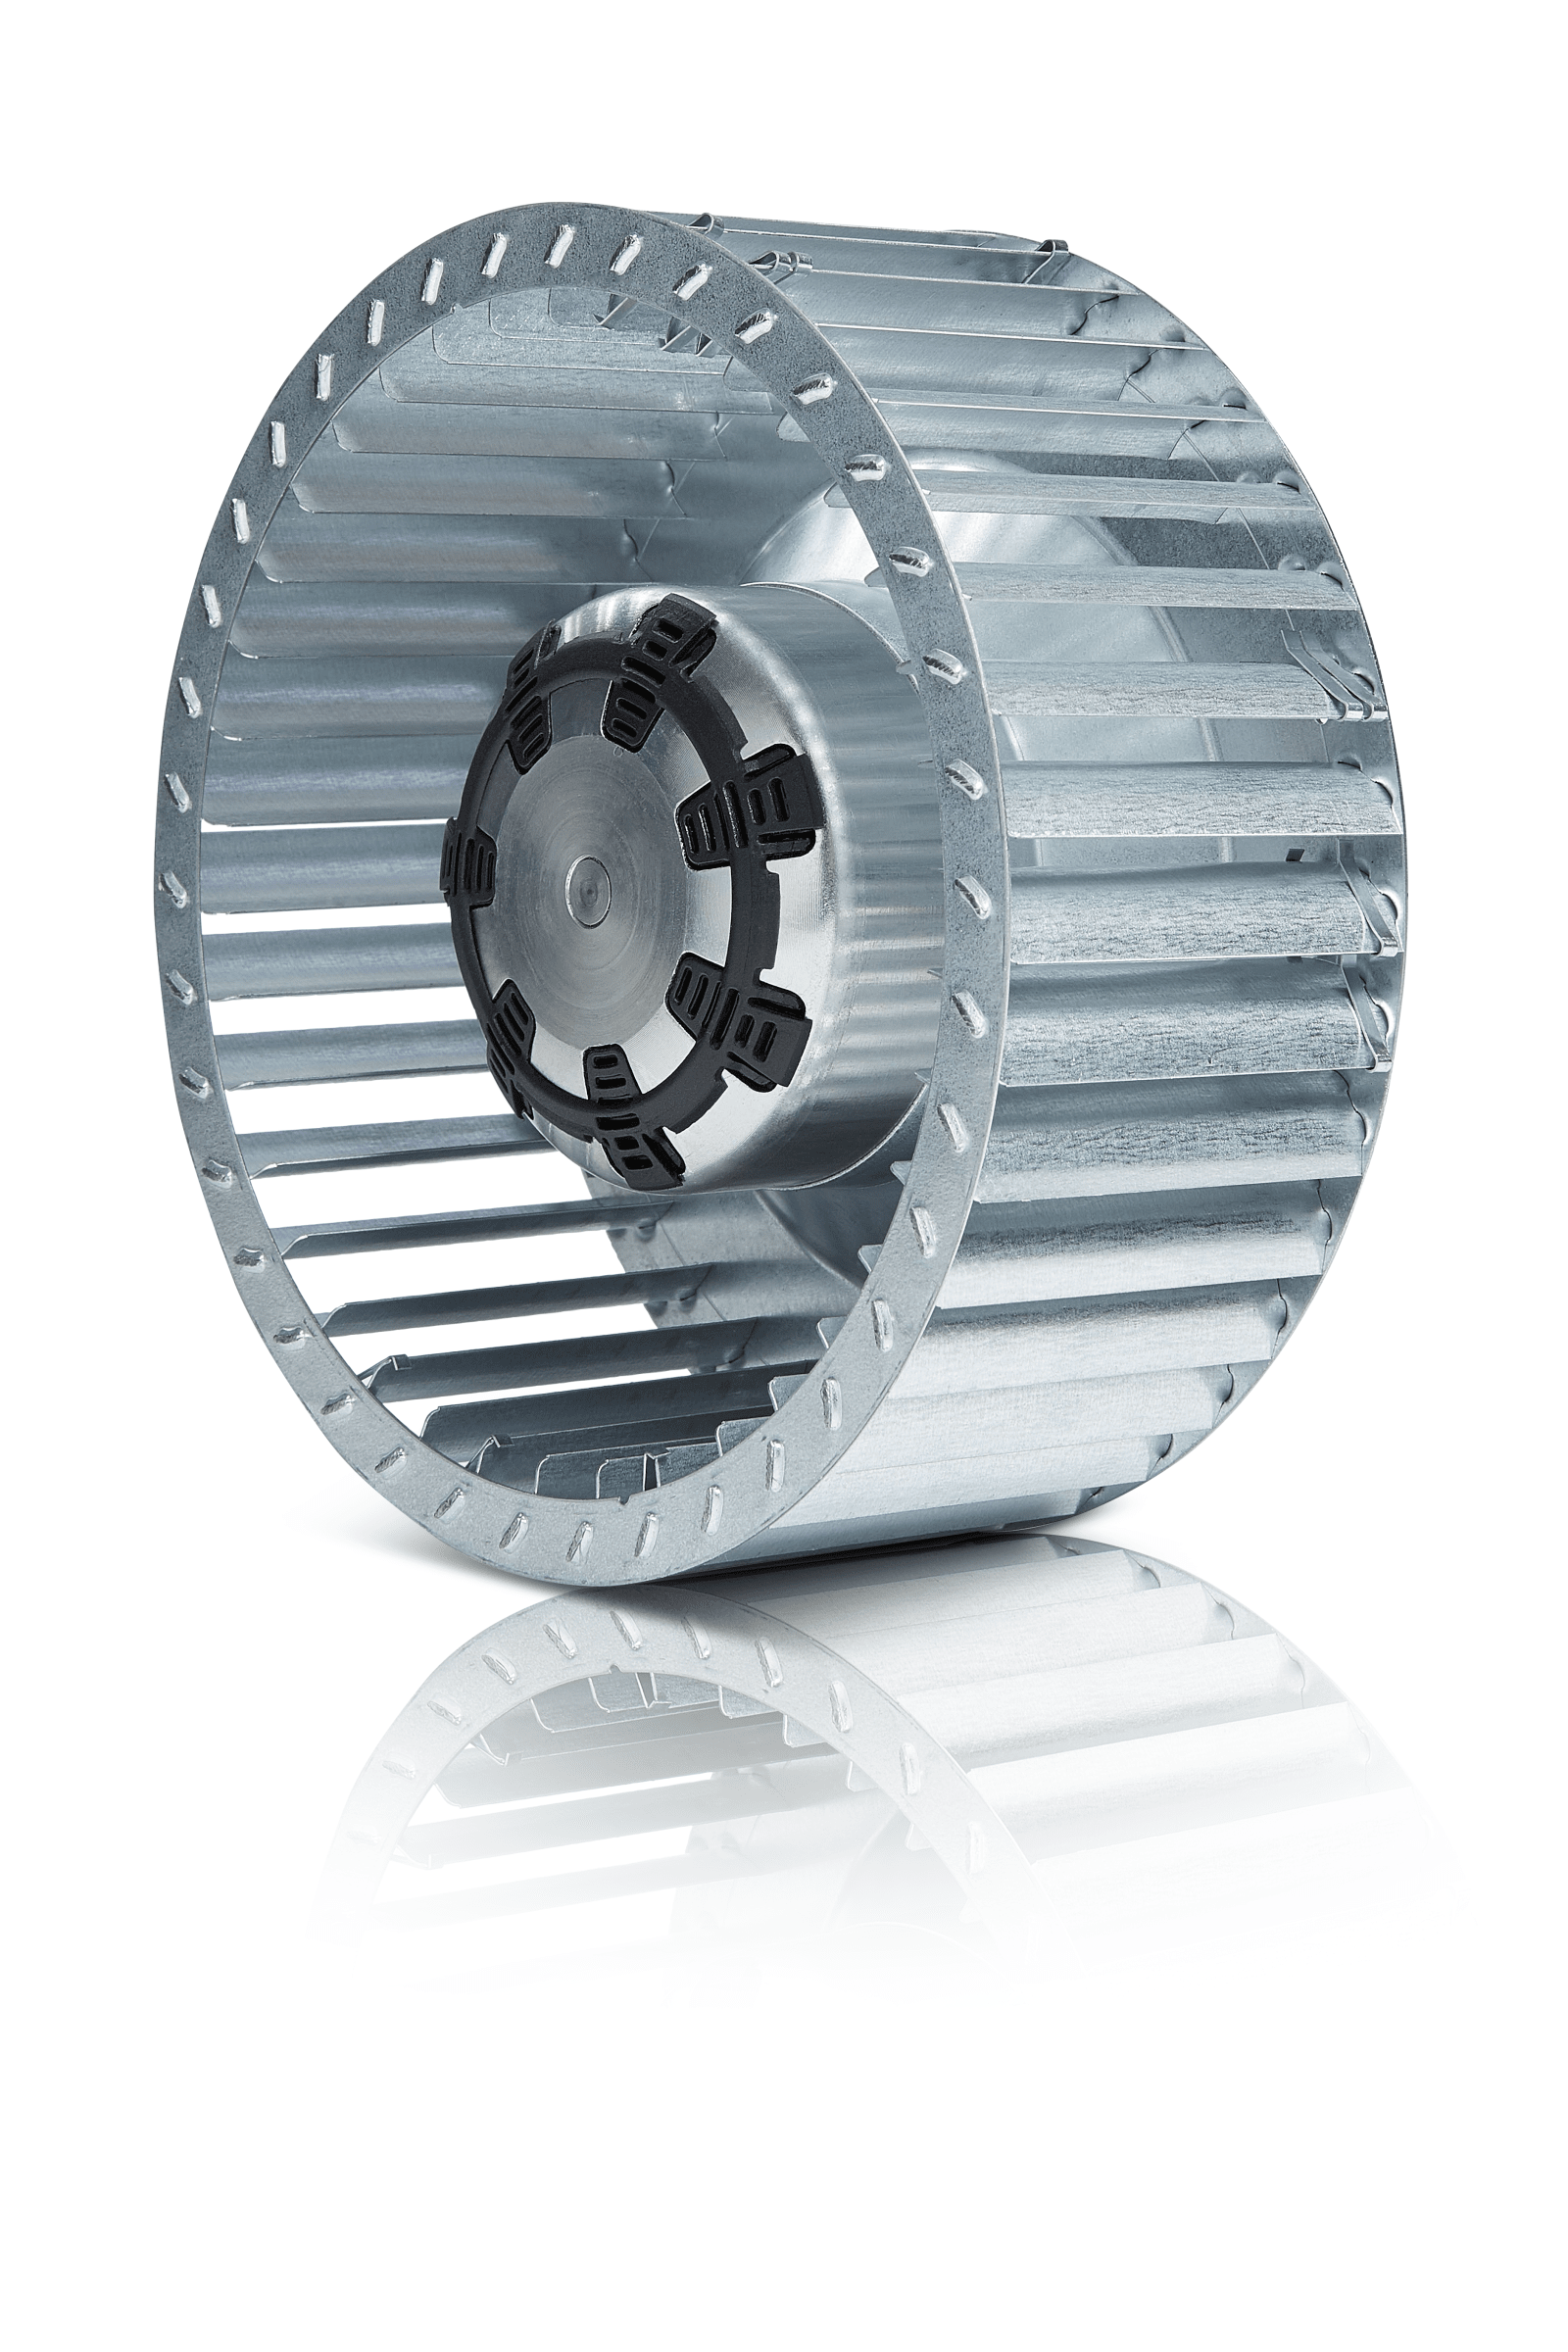 Motorised impellers and plug fans